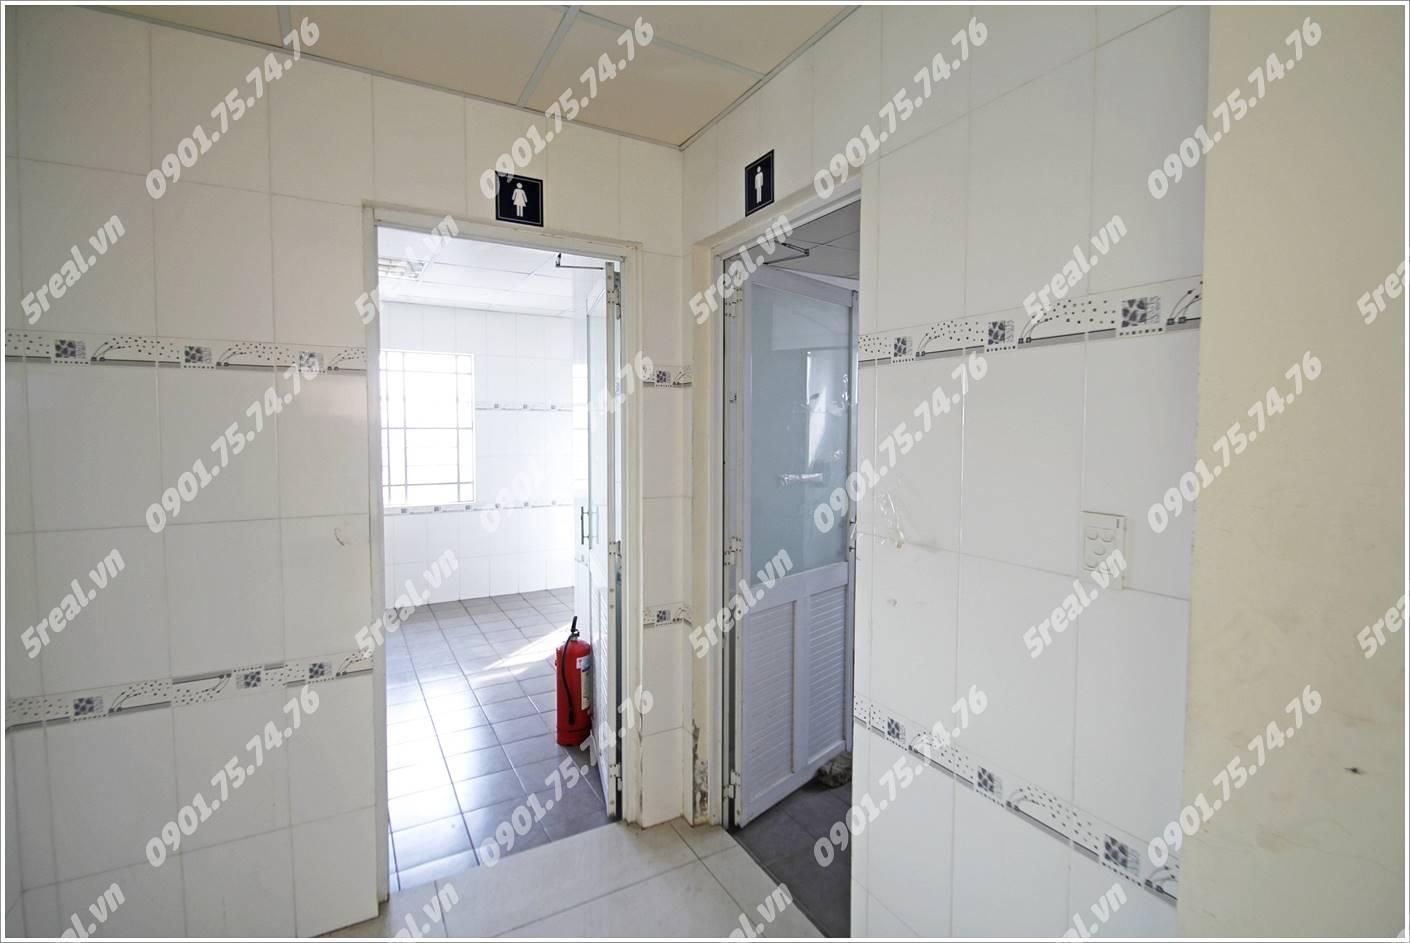 halo-le-trung-nghia-building-quan-tan-binh-van-phong-cho-thue-5real.vn-09